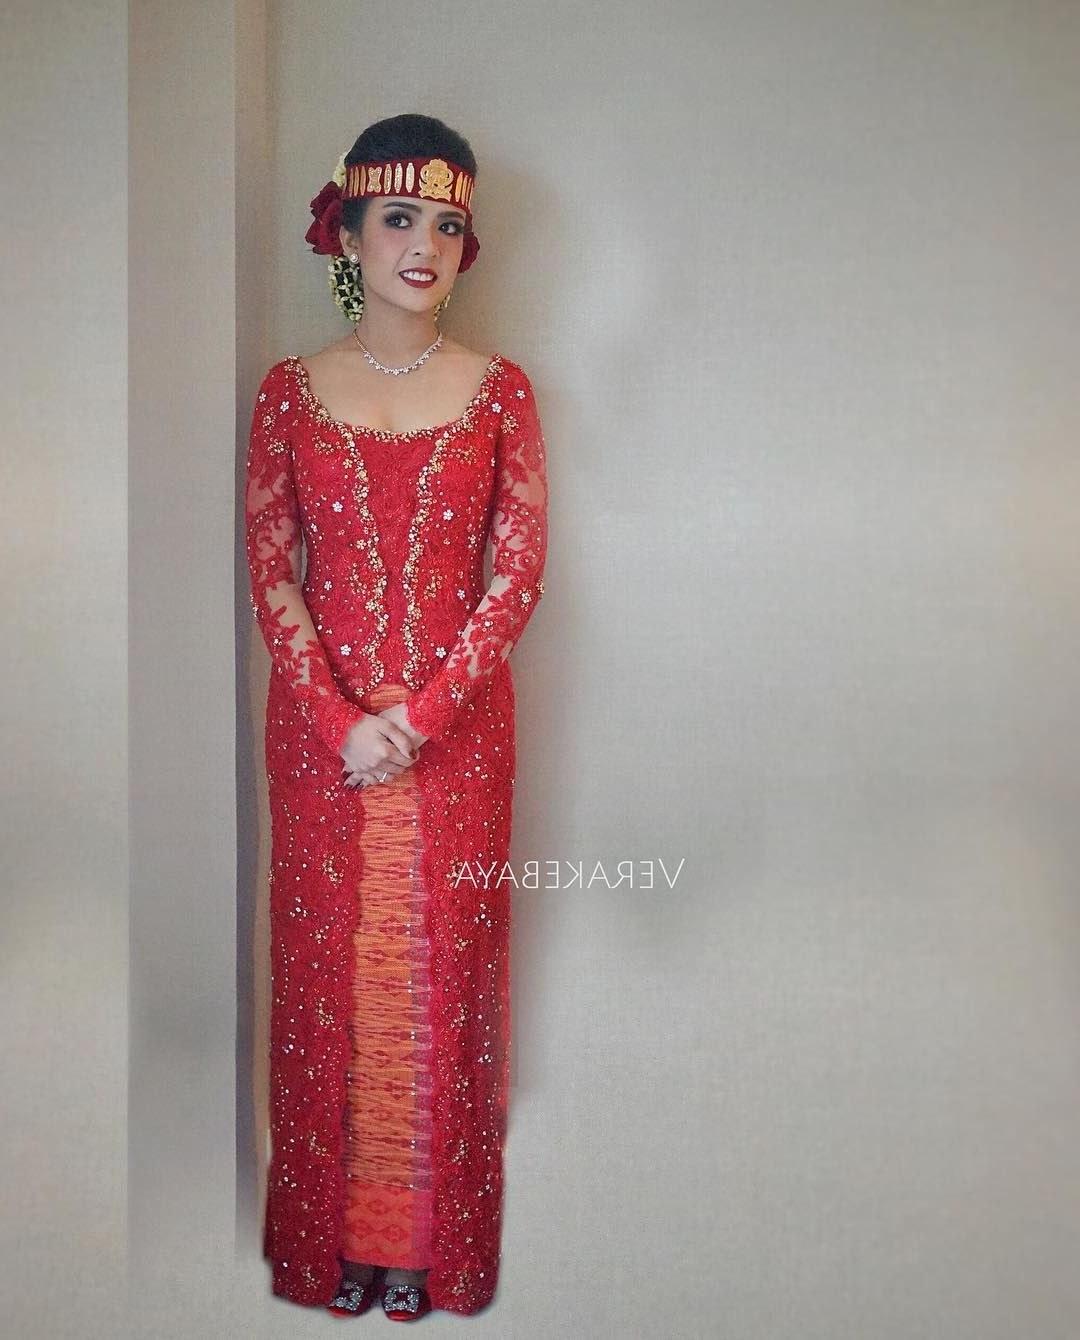 Design Cara Membuat Gaun Pengantin Muslim Tqd3 15 Busana Adat Batak